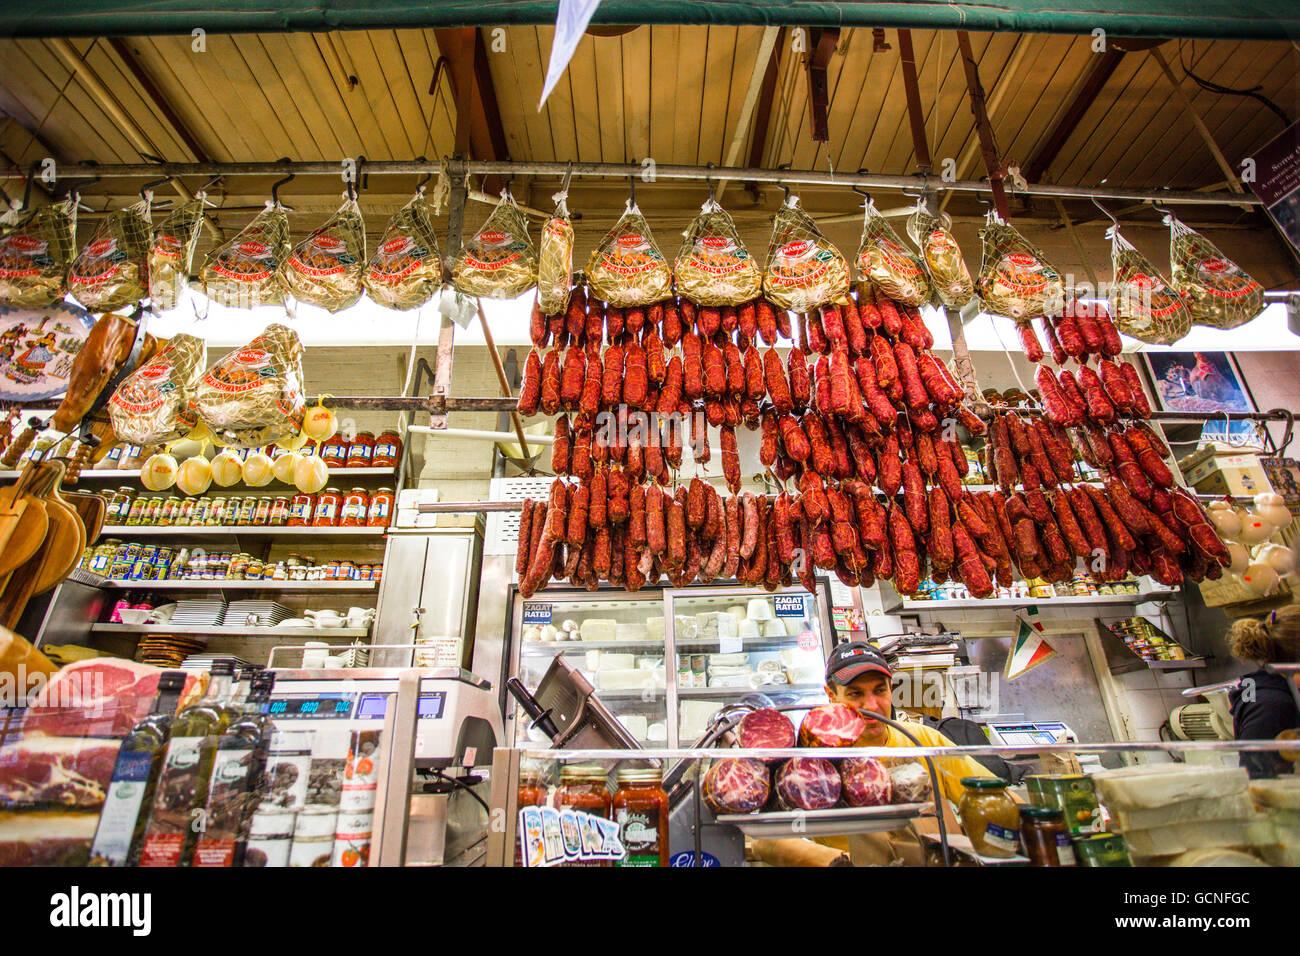 NEW YORK CITY - NOVEMBER 8, 2013: Italian deli in speciality market in Little Italy, Arthur Avenue in The Bronx - Stock Image